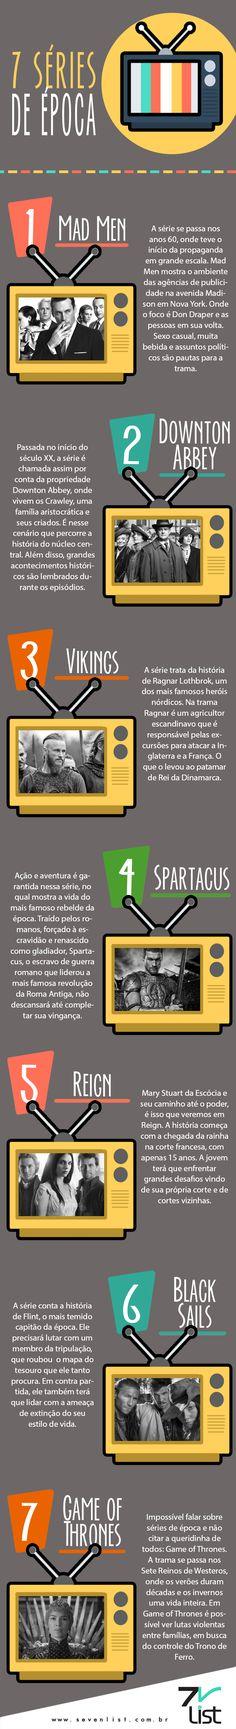 #Sevenlist #Infográfico #Infographic #List #Illustration #Lista #Ilustração #Desenho #Séries #Tvshow #Tv #Sériedeépoca #Madmen #Downtonabbey #Vikings #Spartacus #Reign #Blacksails #Gameofthrones